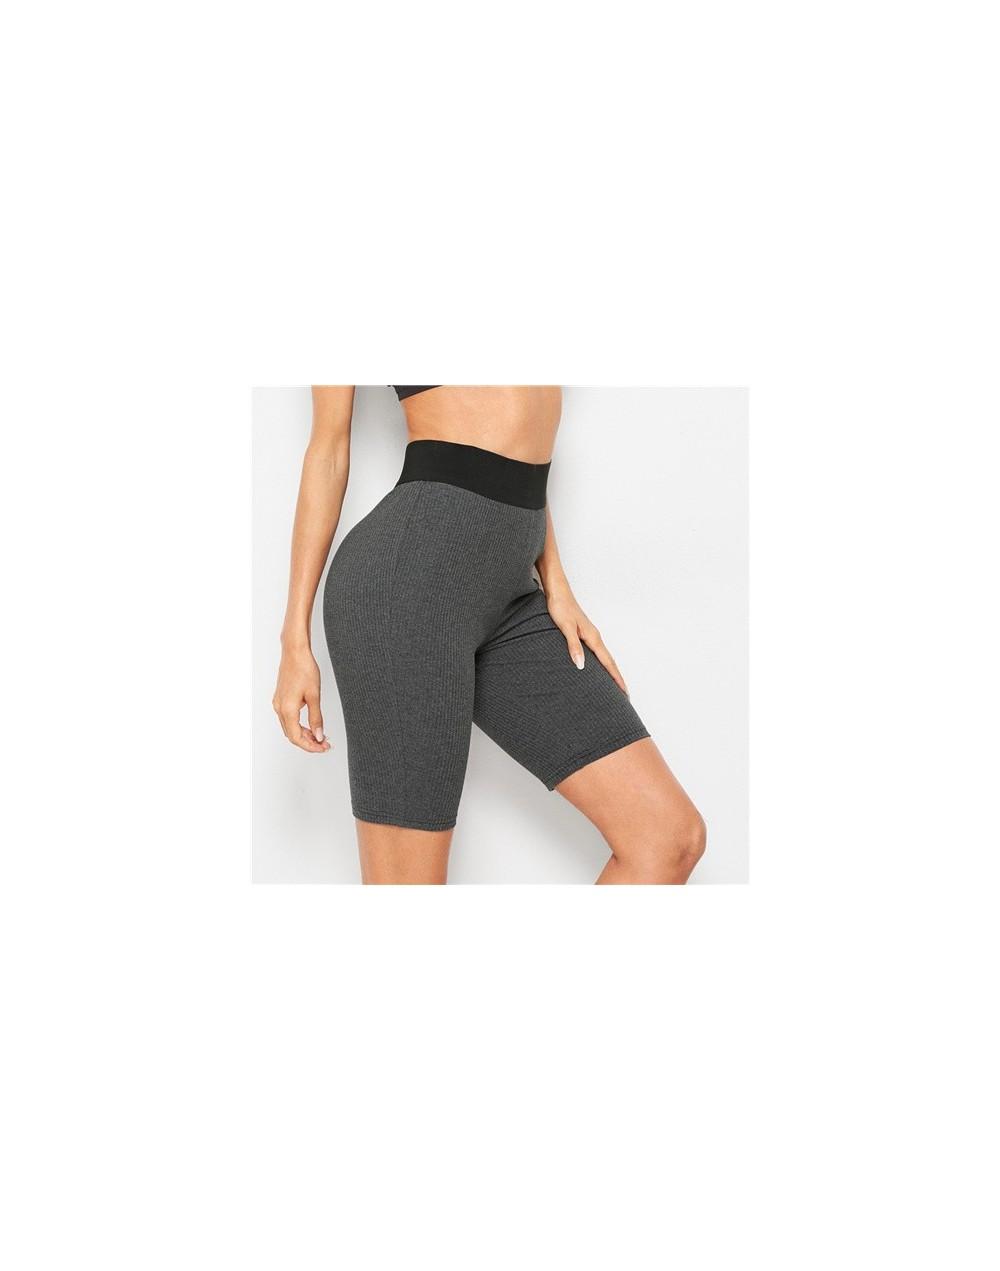 Contrast Waist Rib-knit Skinny Cycling Shorts Active Wear Women Biker Shorts 2019 Summer Fitness Casual Grey Shorts - Dark G...